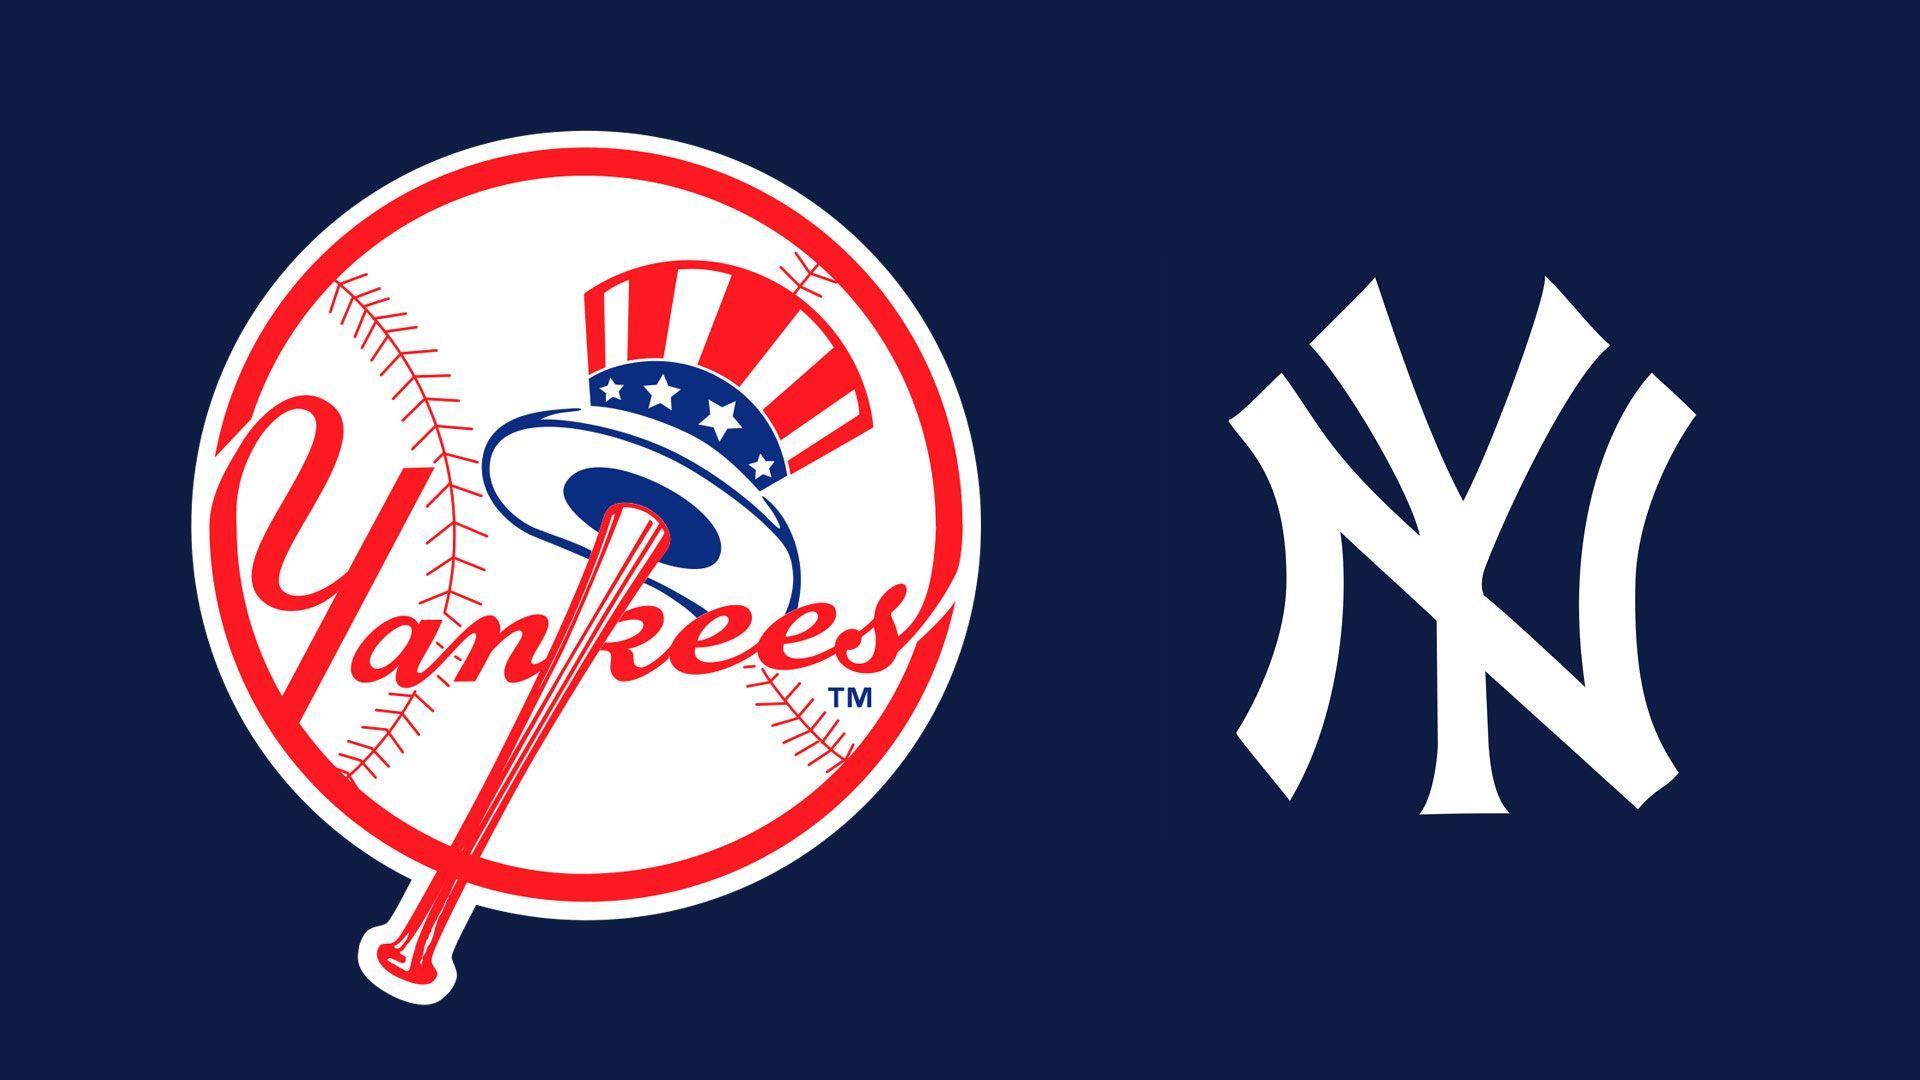 Mlb New York Yankees Logo 1920x1080 Wallpaper New York Yankees